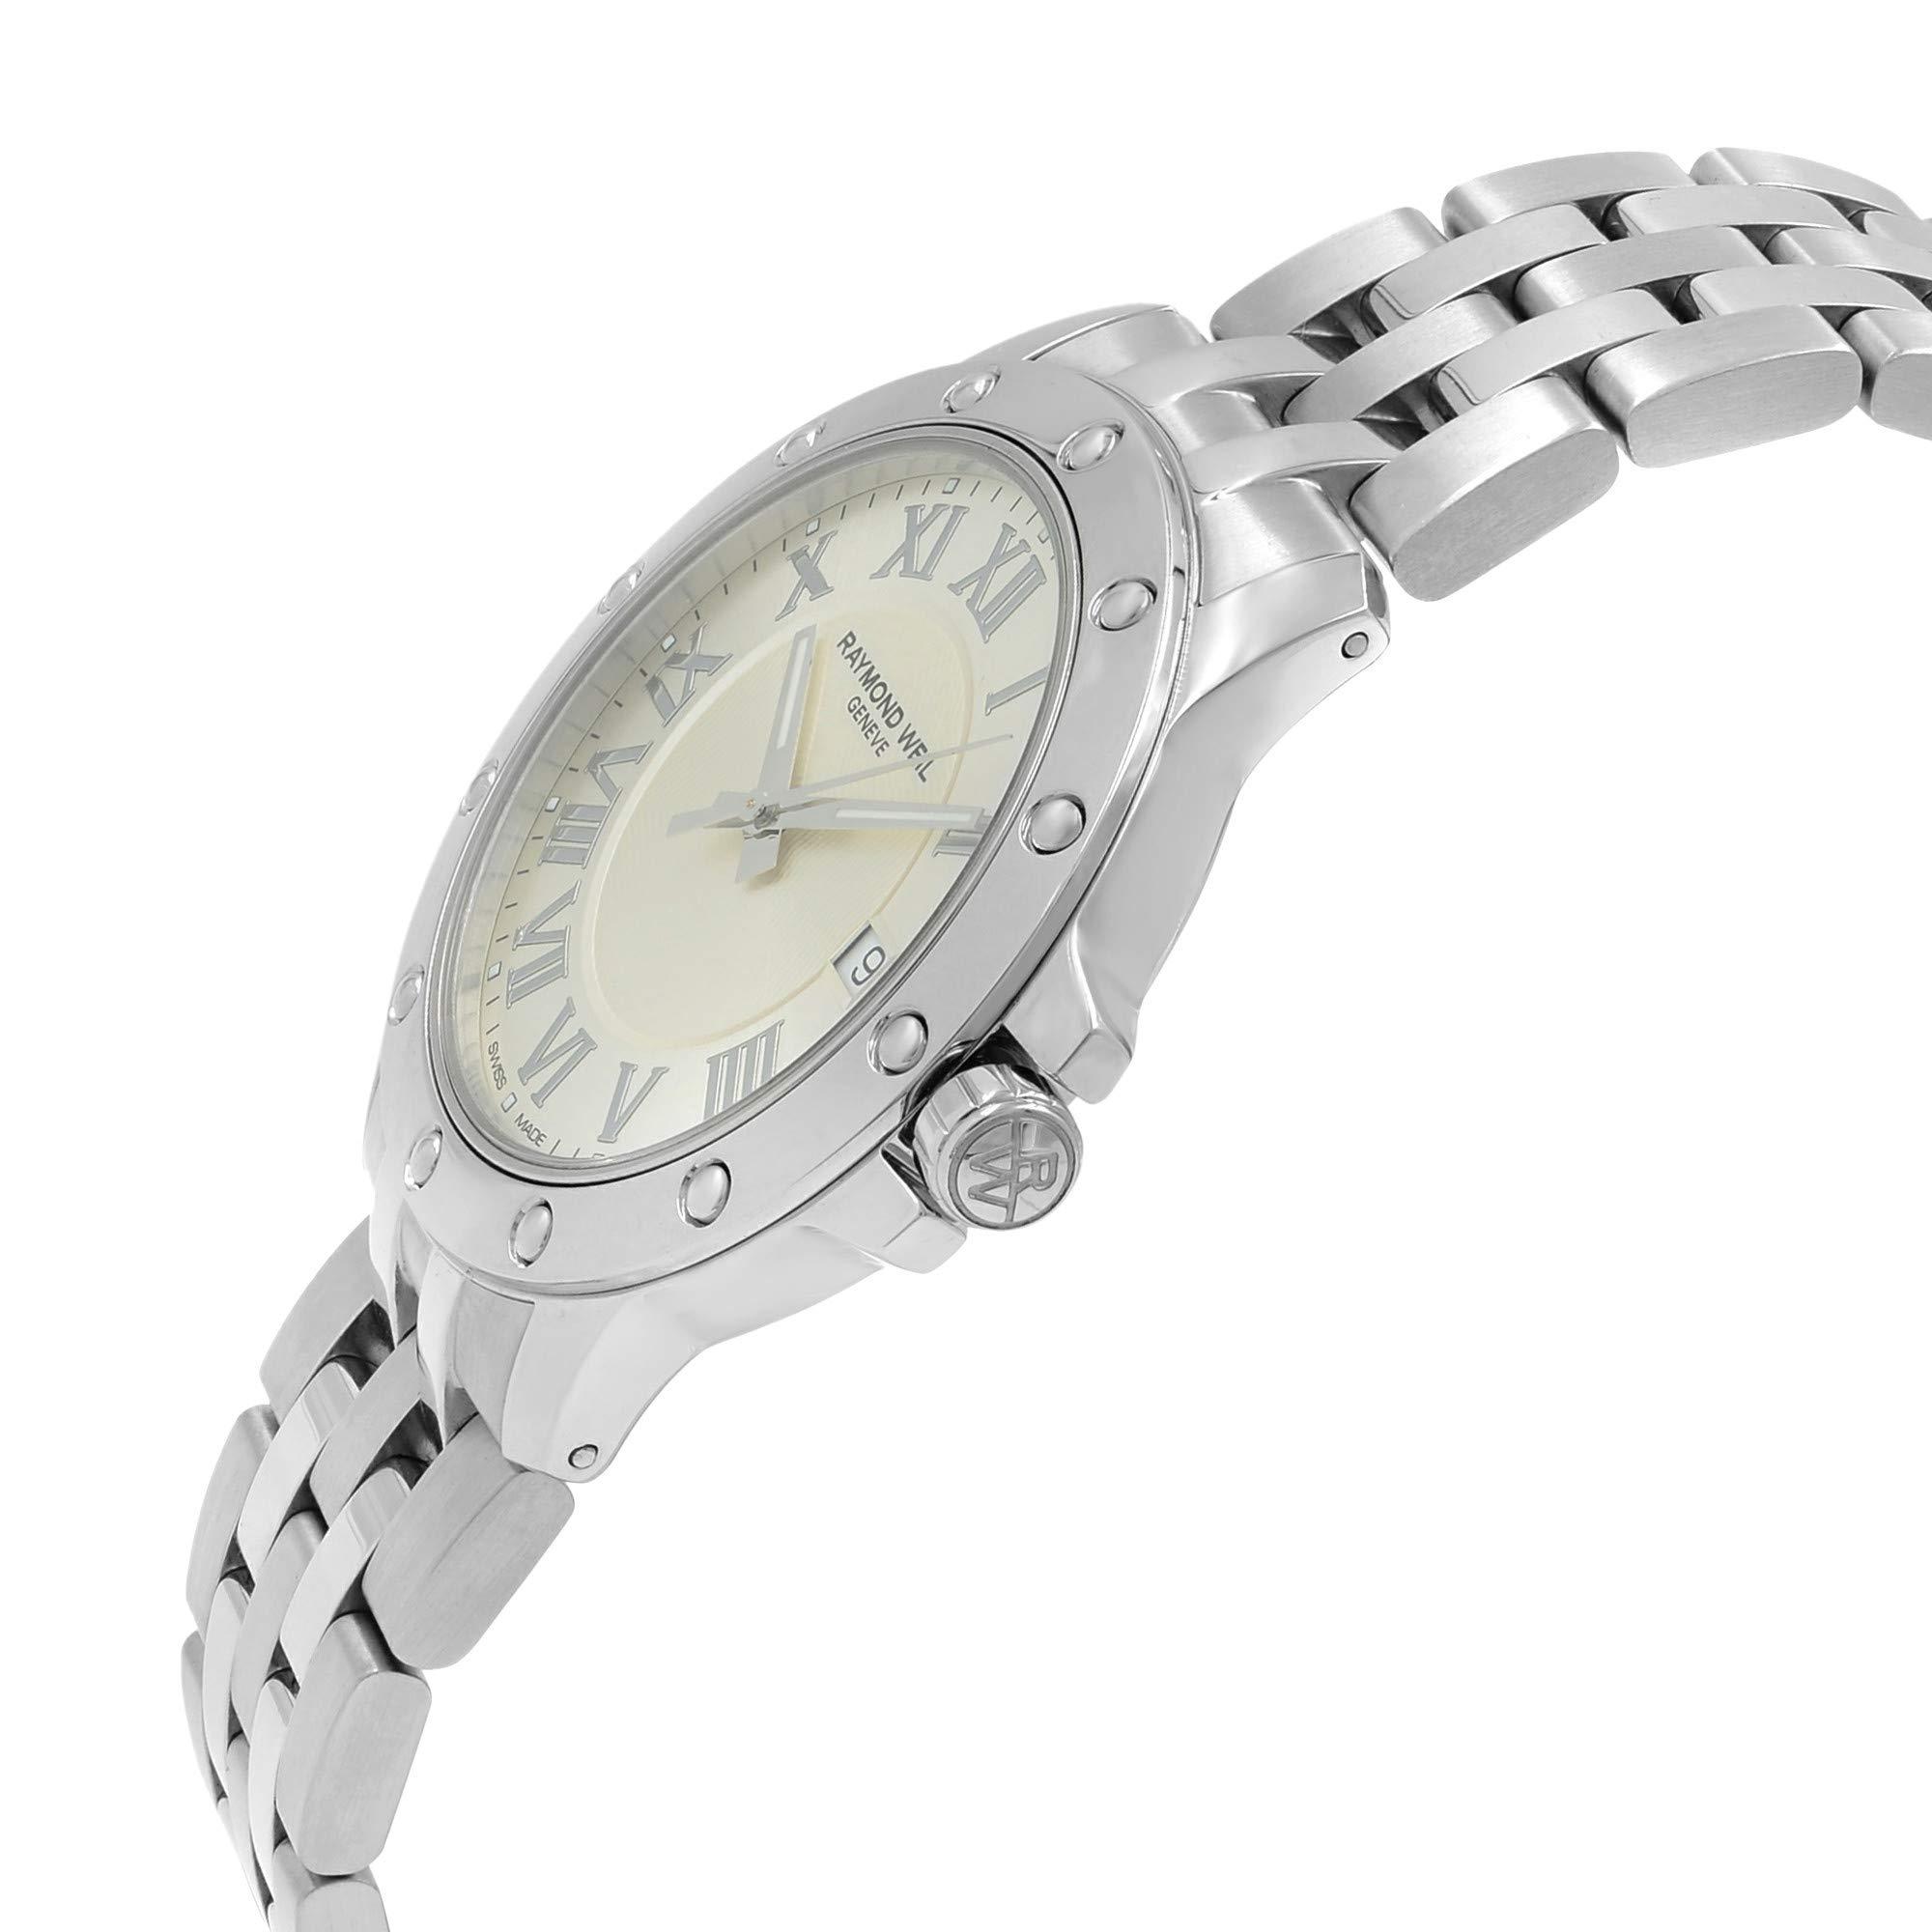 Raymond Weil Tango Quartz Male Watch 5599-ST-00658 (Certified Pre-Owned) by RAYMOND WEIL (Image #3)